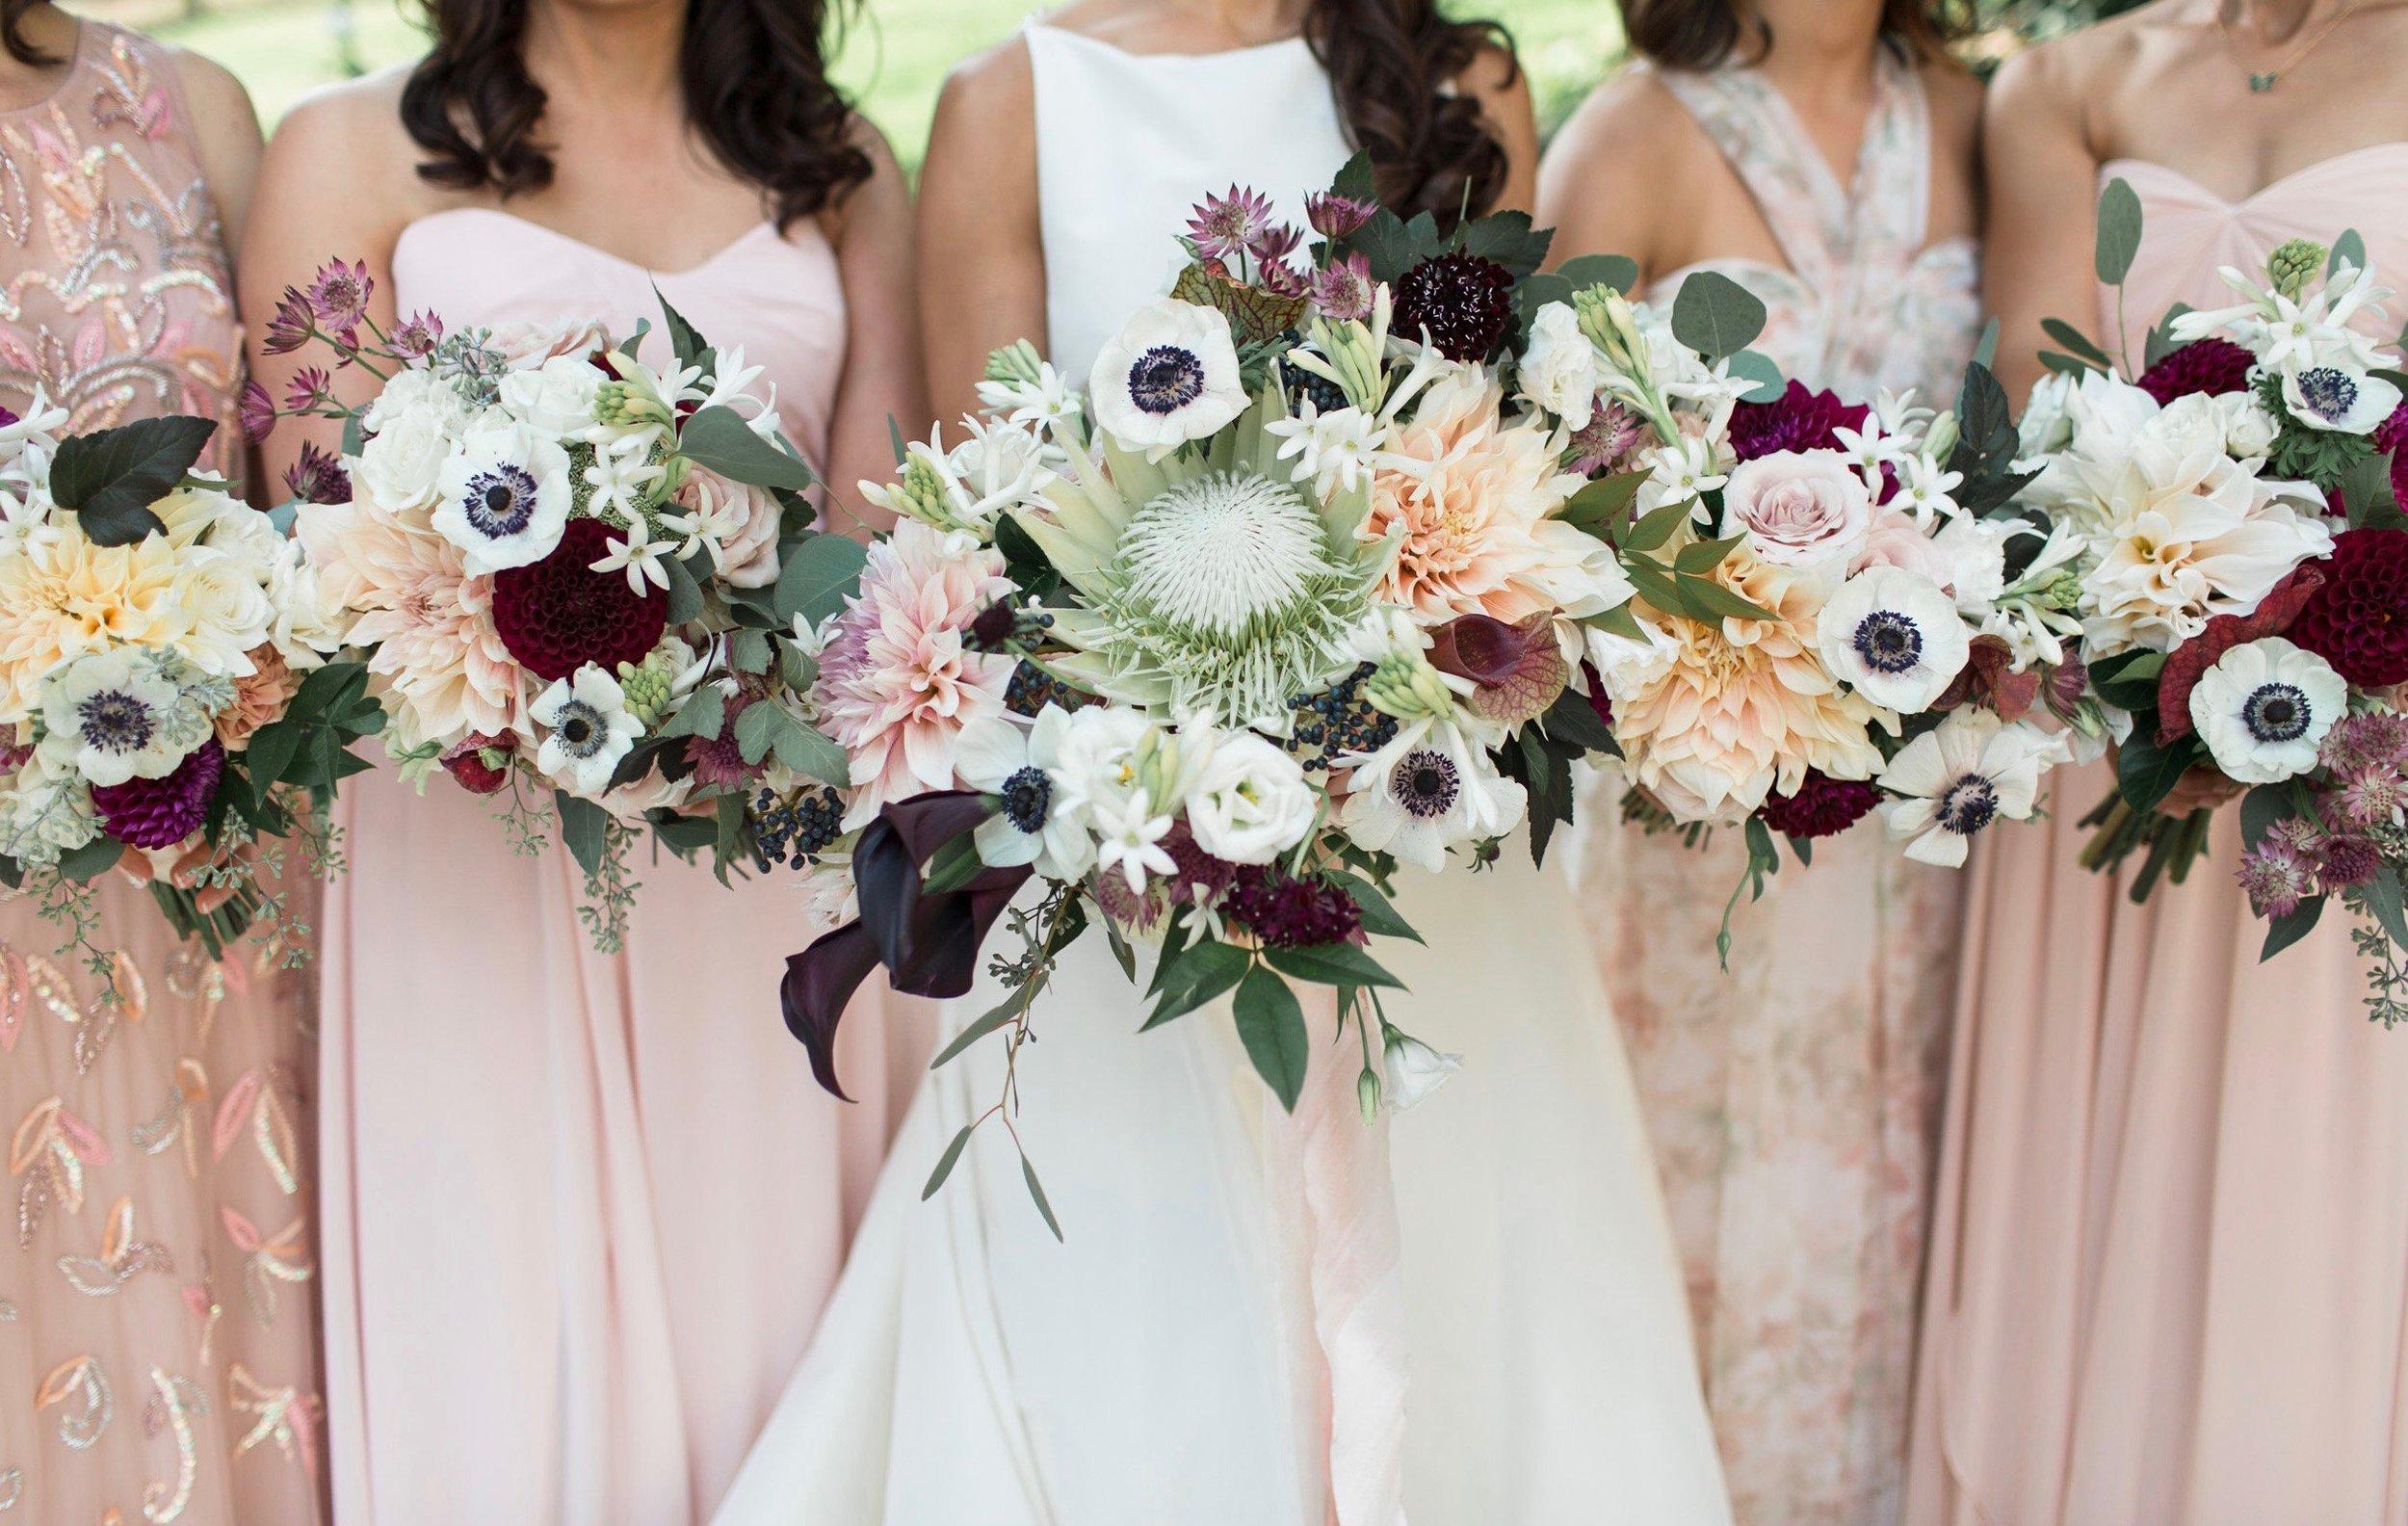 Stunning bridal bouquet at Tranquility Farm.jpg